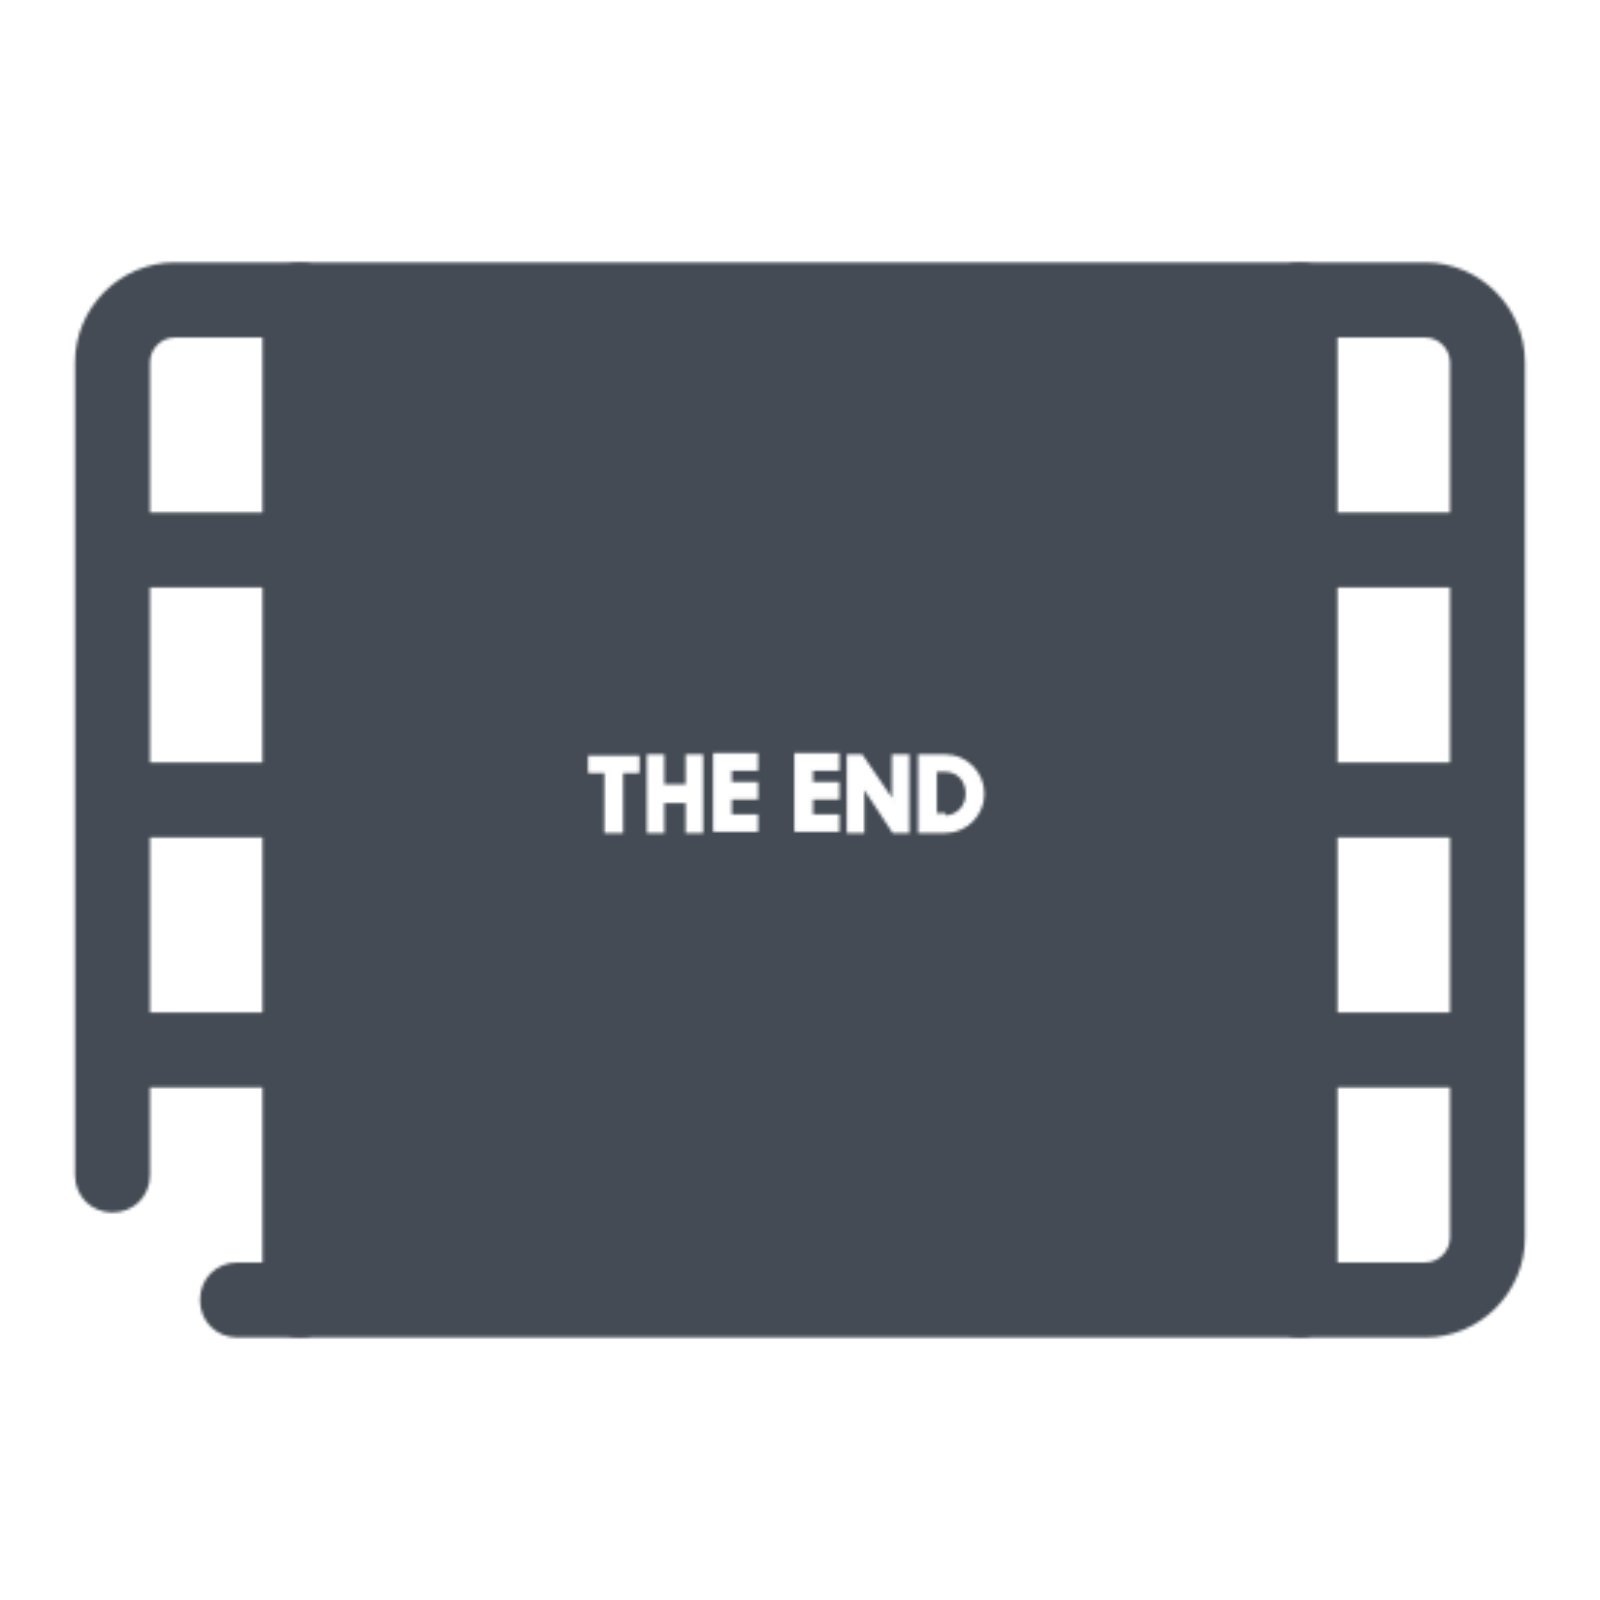 Movie End icon